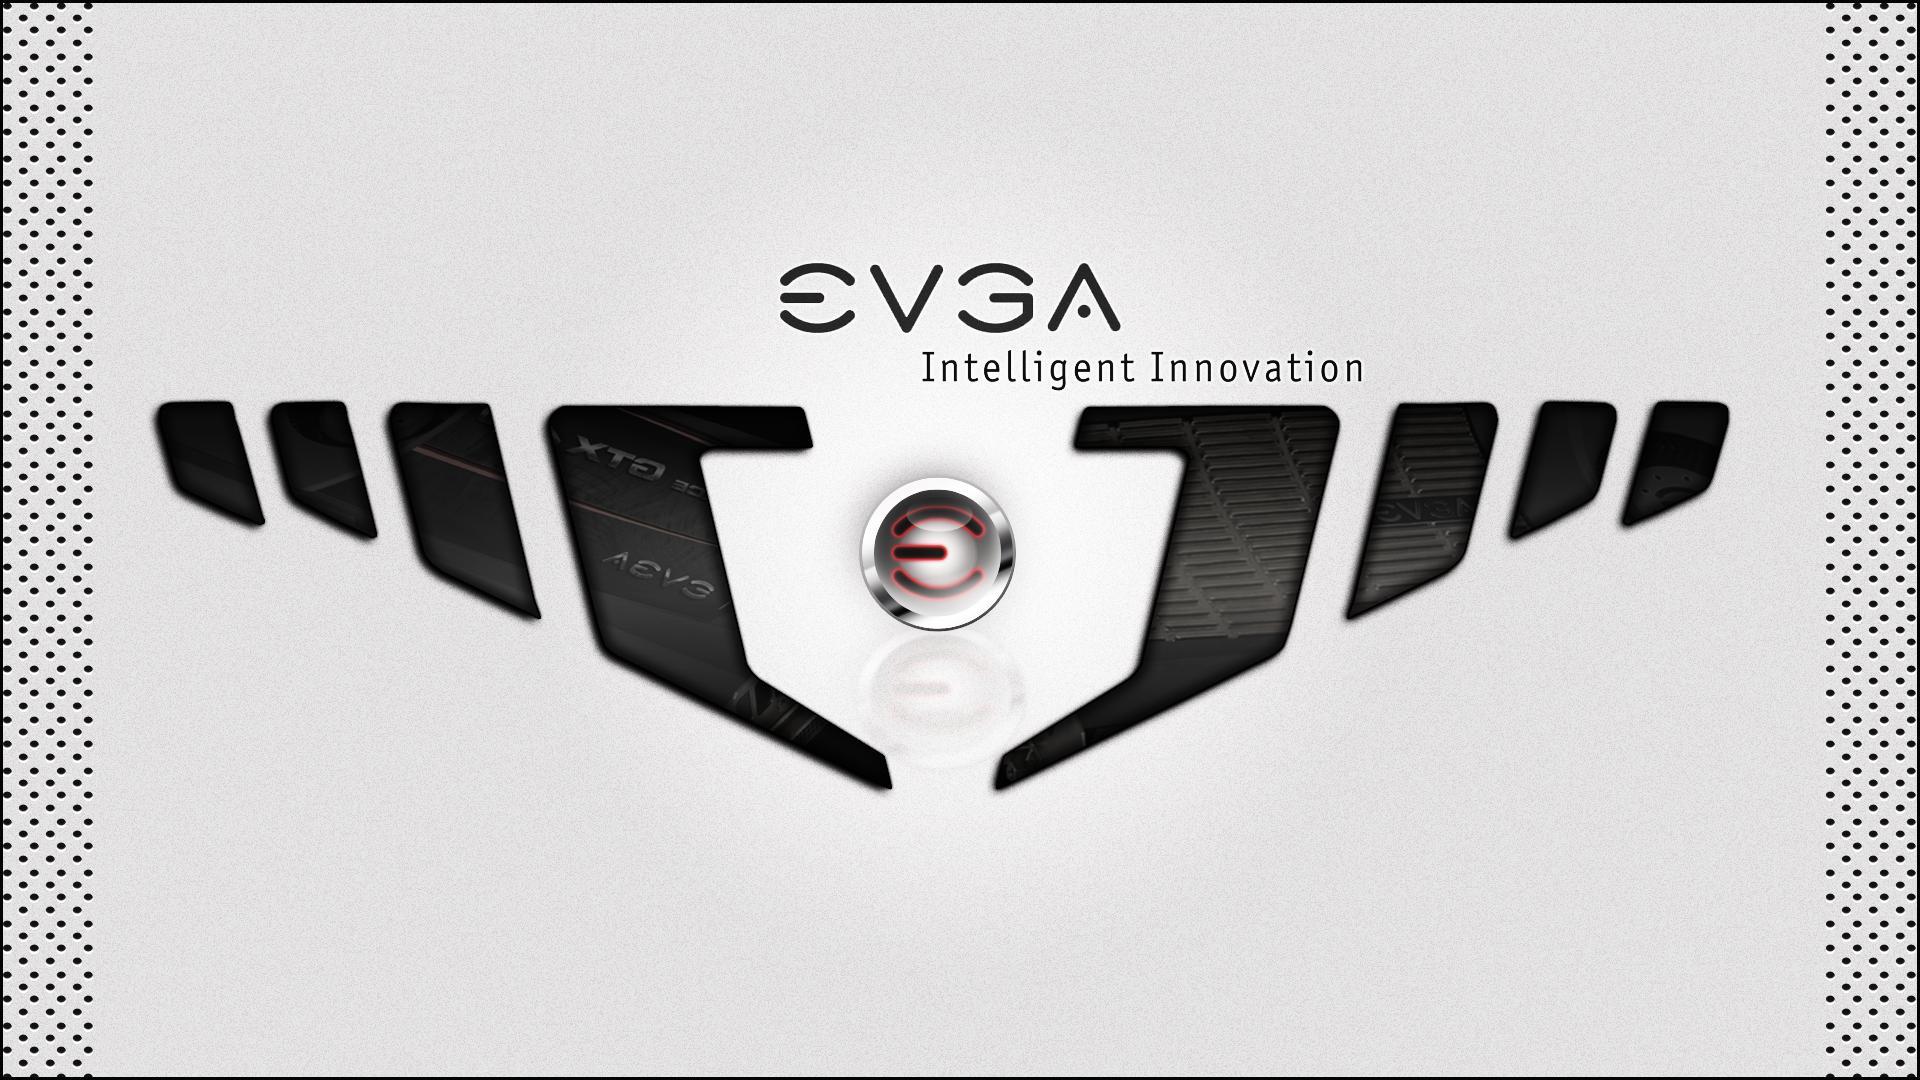 Evga Wallpapers - Wallpaper Cave